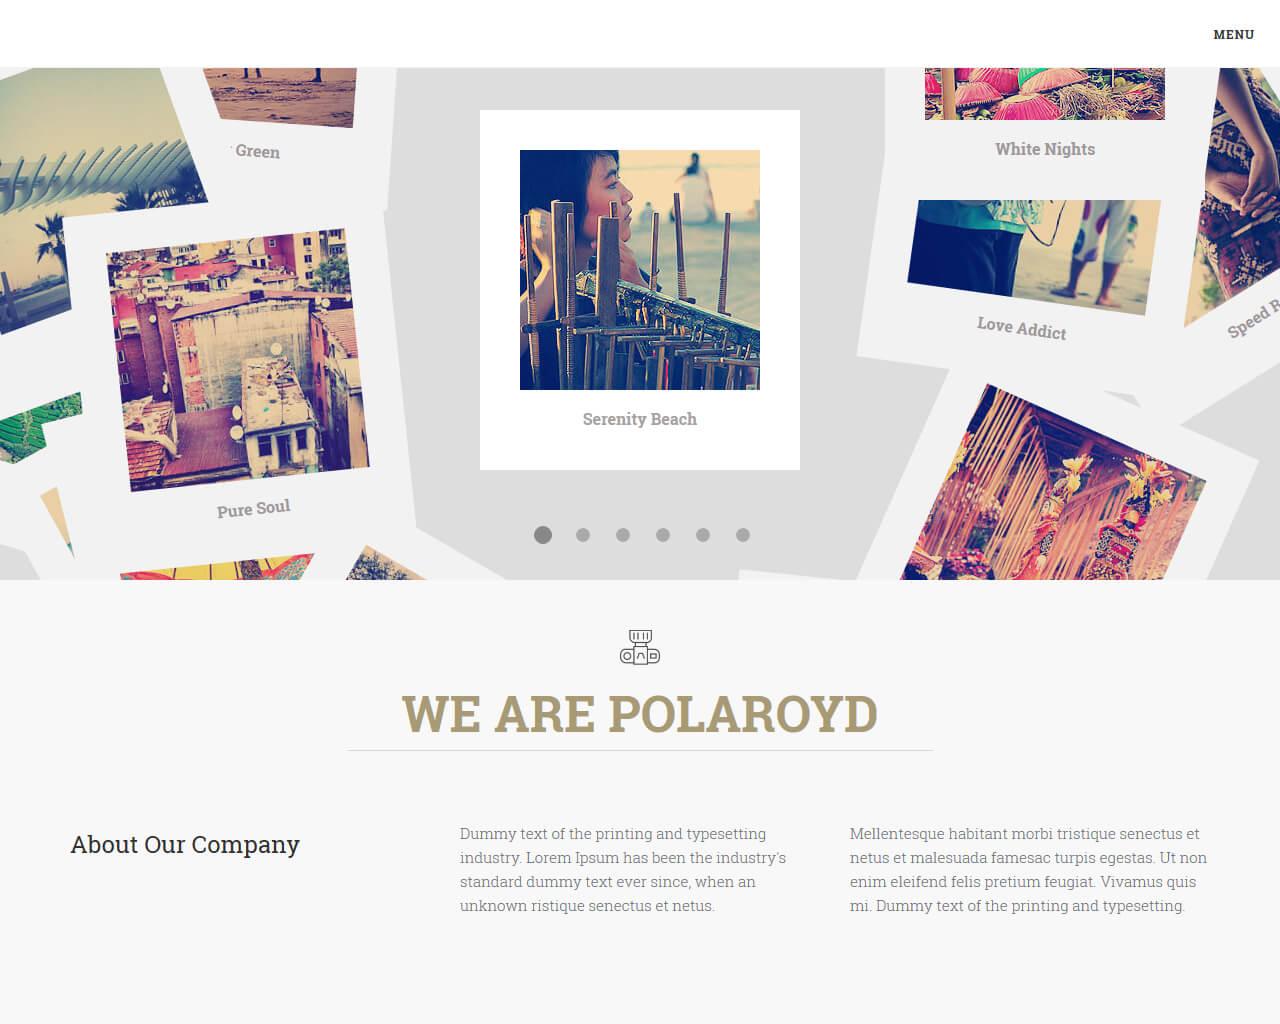 Polaroyd - Elegant Agency Template